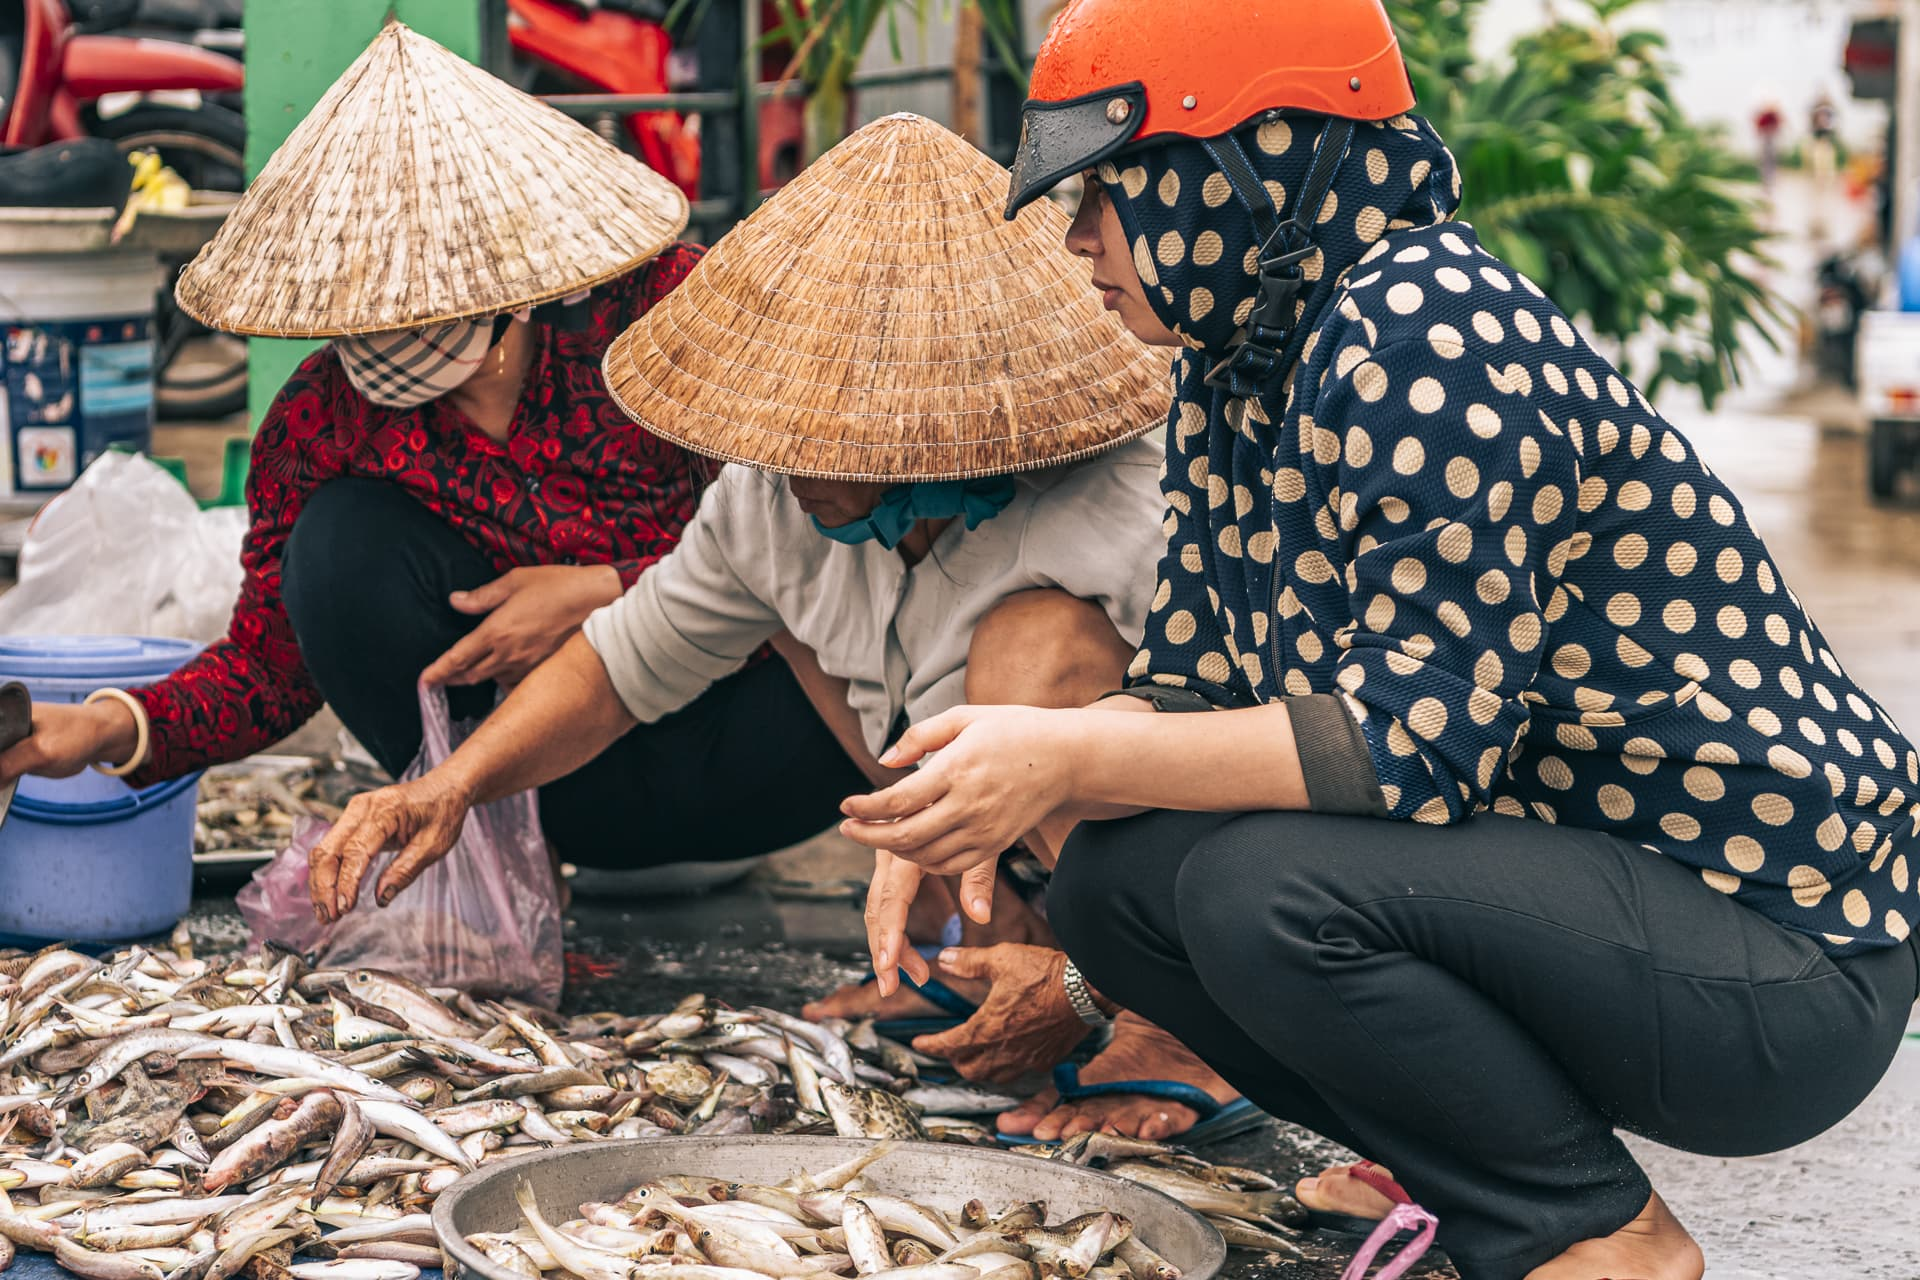 Traders sorting through freshly caught fish at the Cau Sau market.